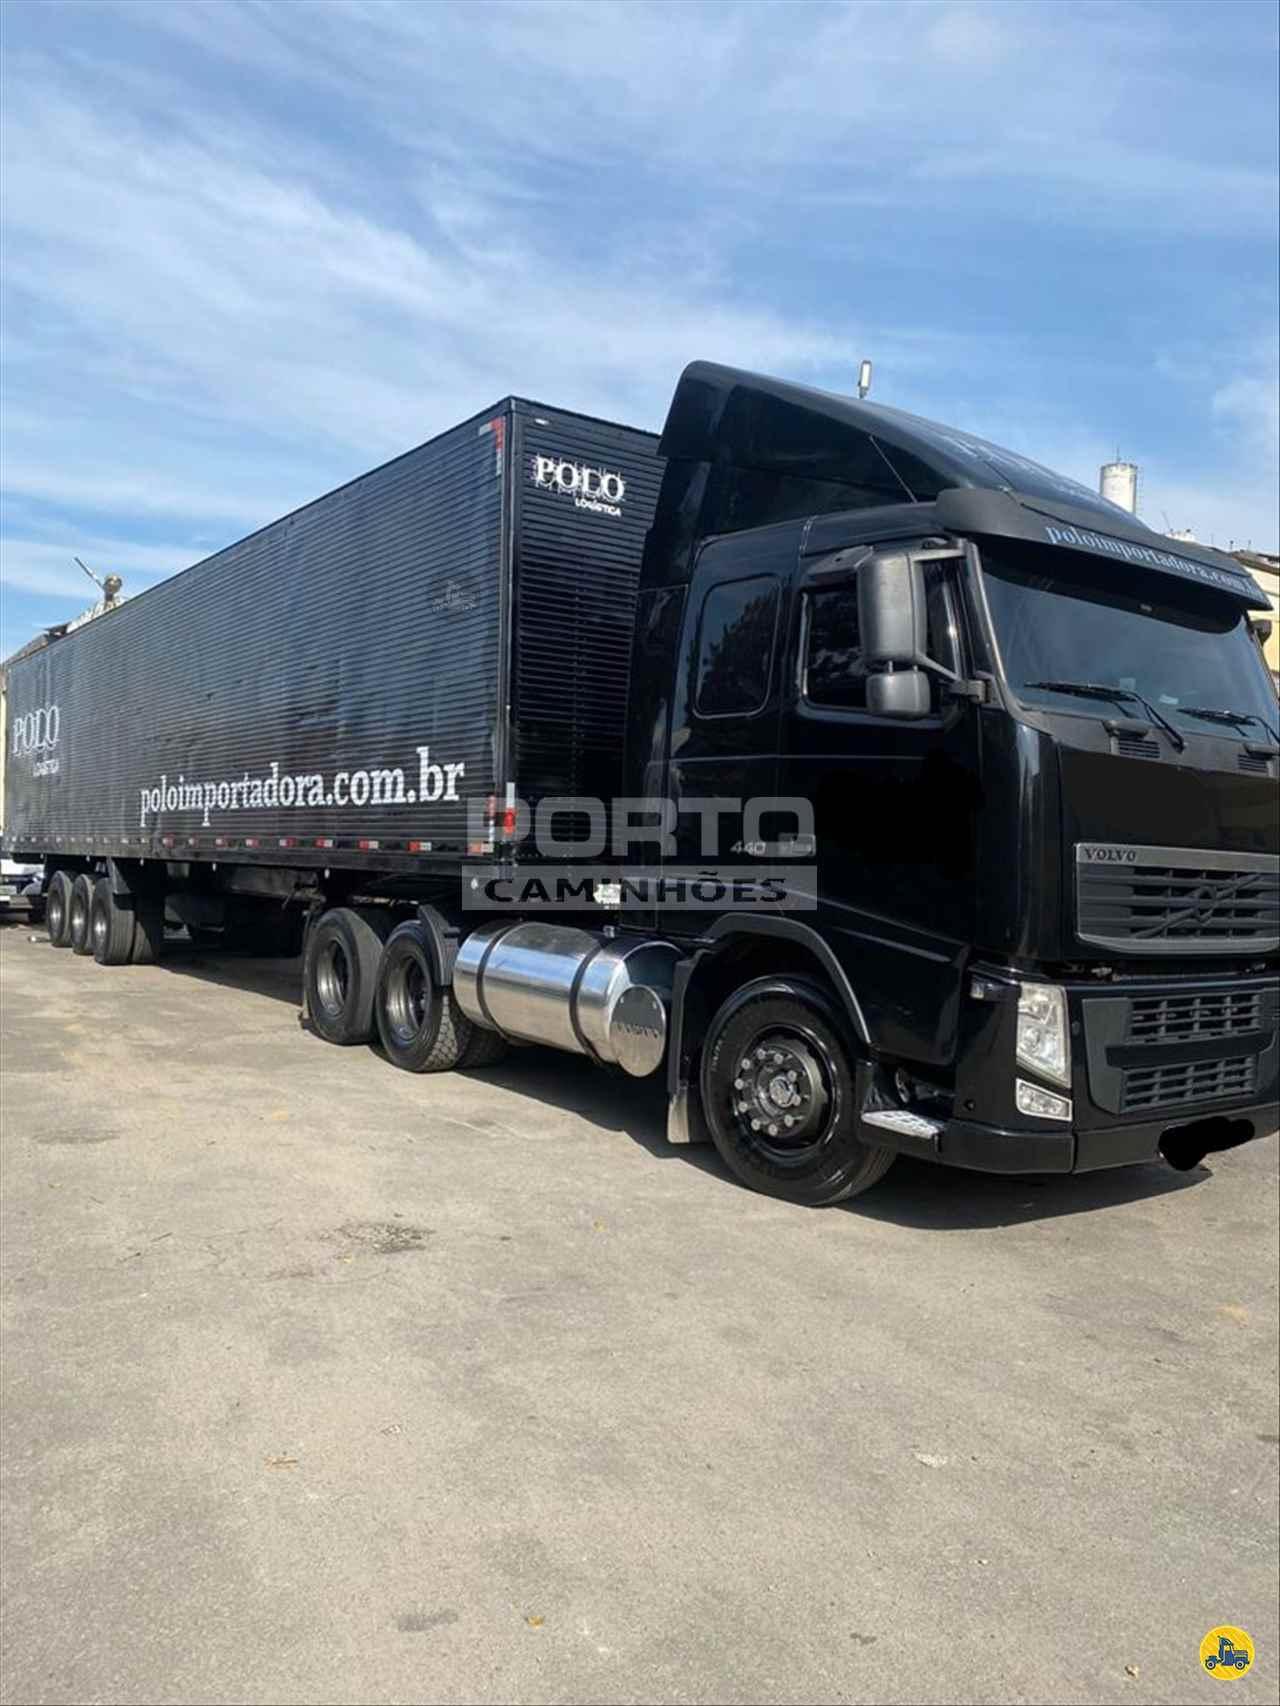 CAMINHAO VOLVO VOLVO FH 440 Cavalo Mecânico Truck 6x2 Porto Caminhões GUARULHOS SÃO PAULO SP